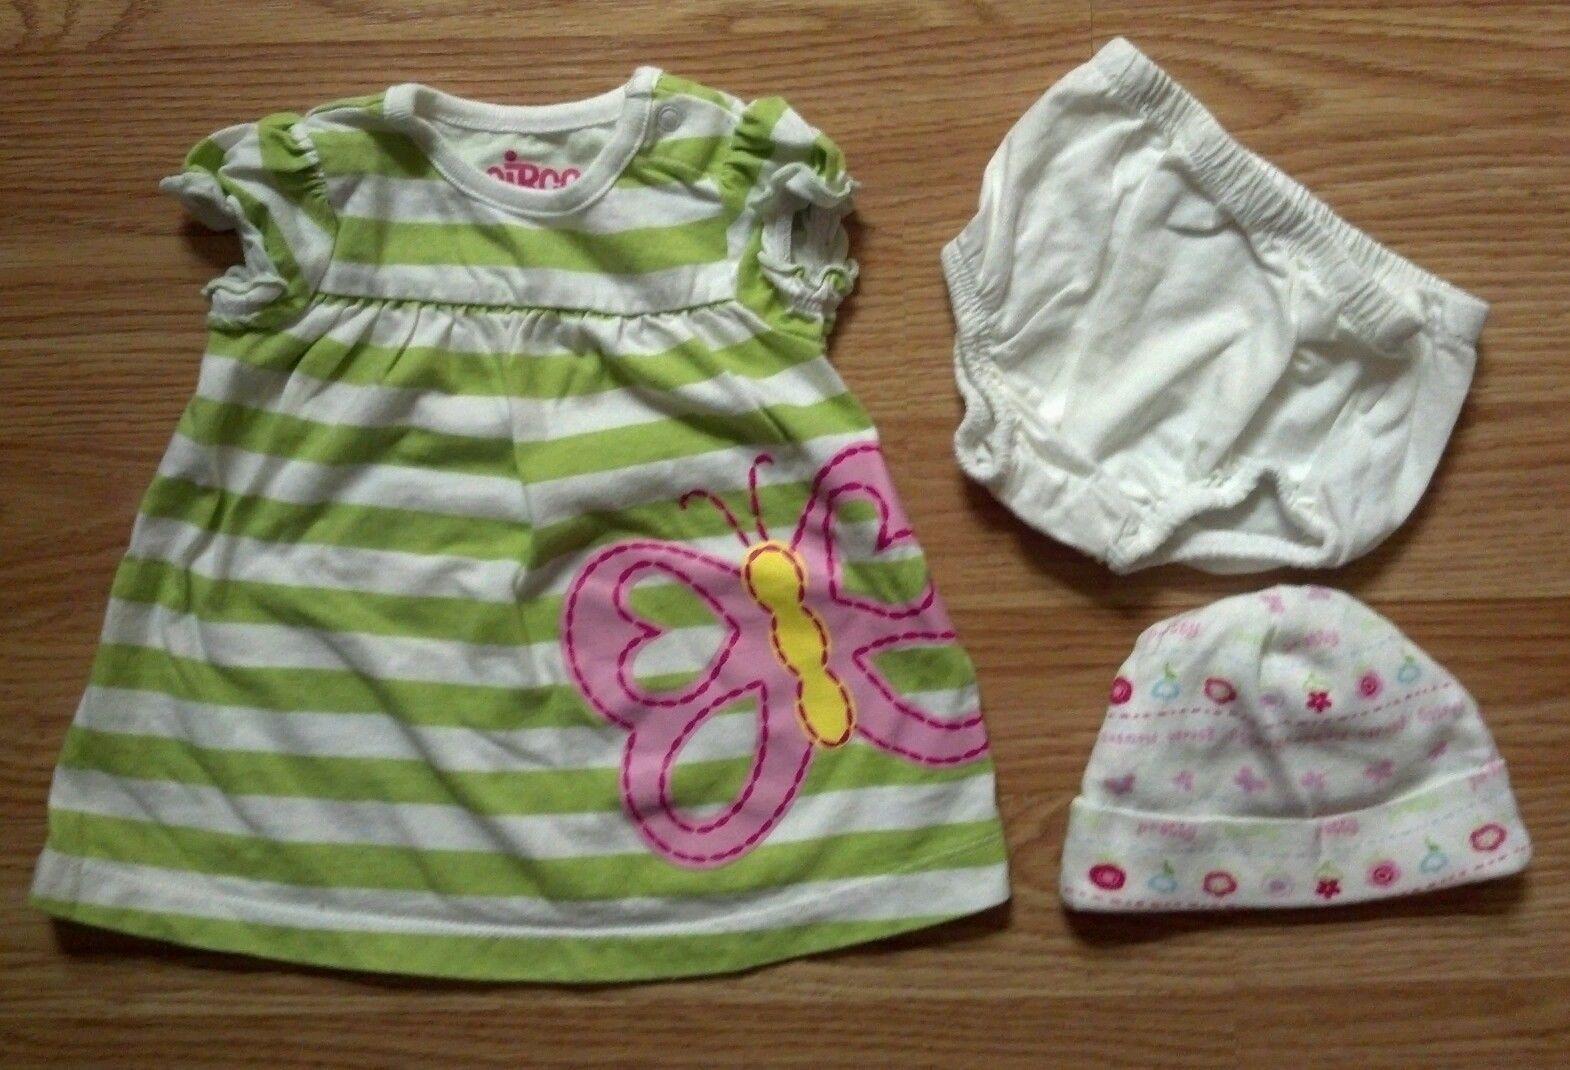 83c6b0645 Girl's Size NB Newborn 2 Piece Top & Bottom and 45 similar items. S l1600